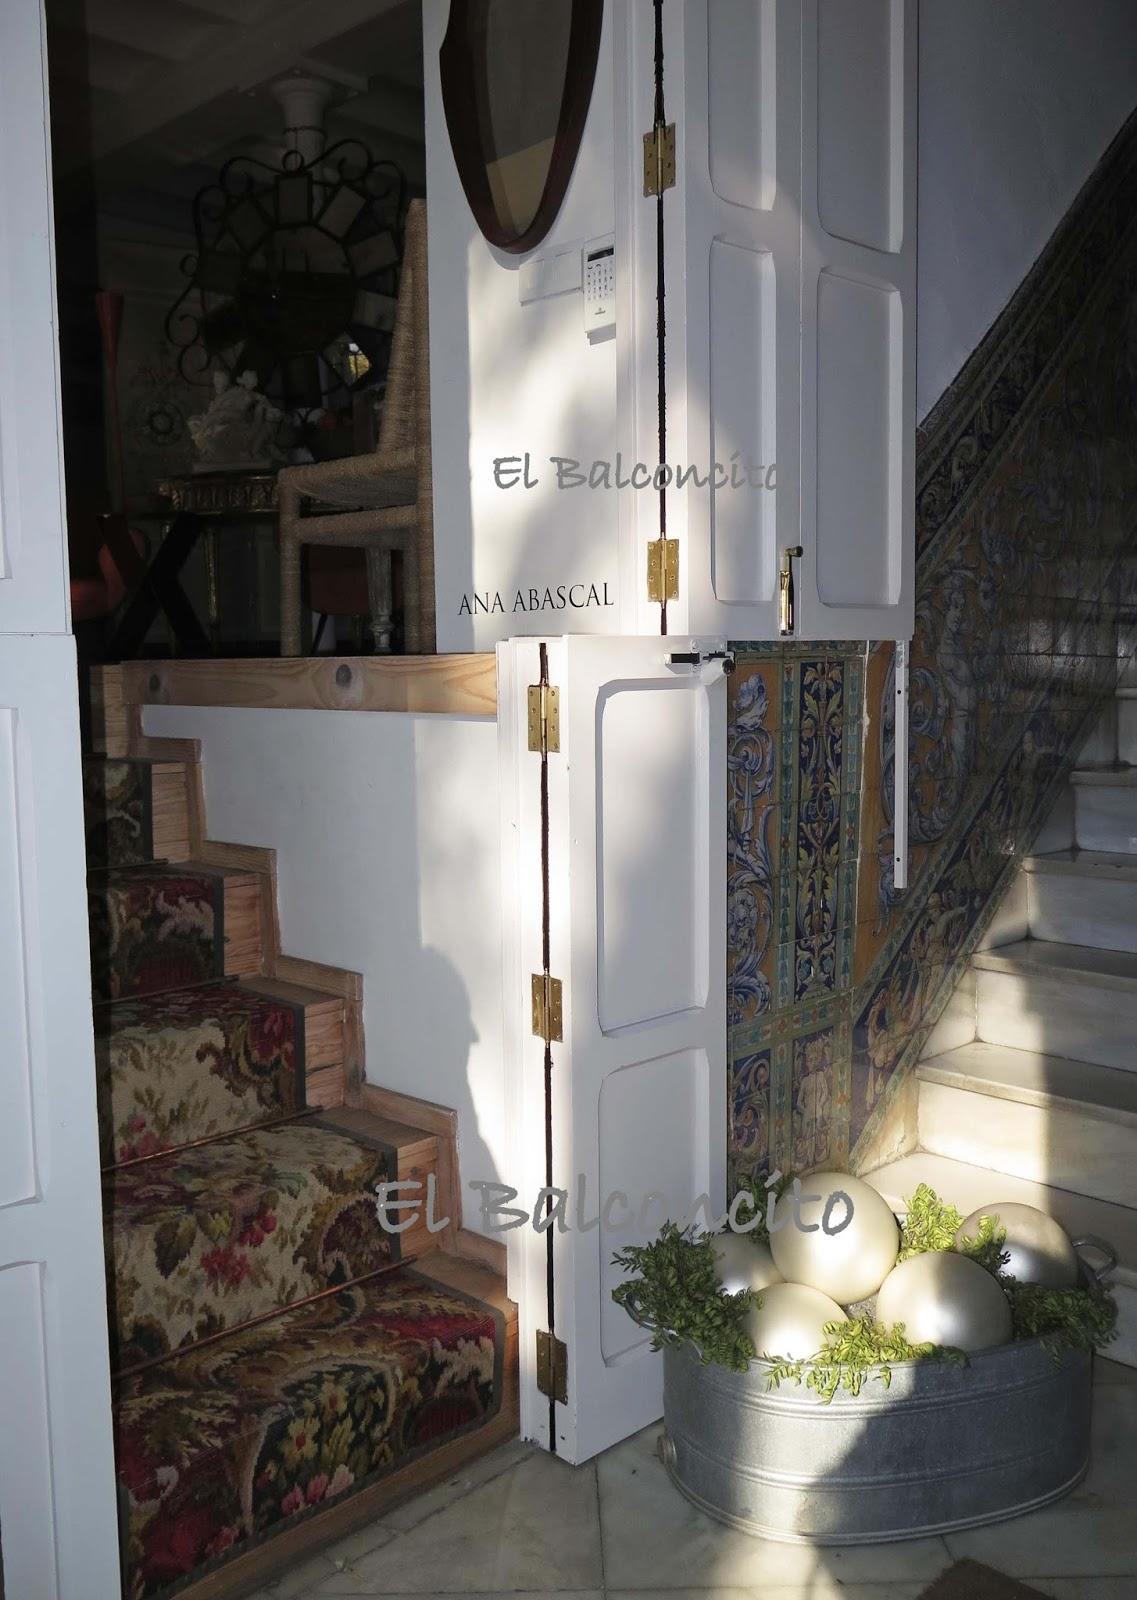 El balconcito decoraci n e interiorismo por ana abascal - Decoracion e interiorismo ...